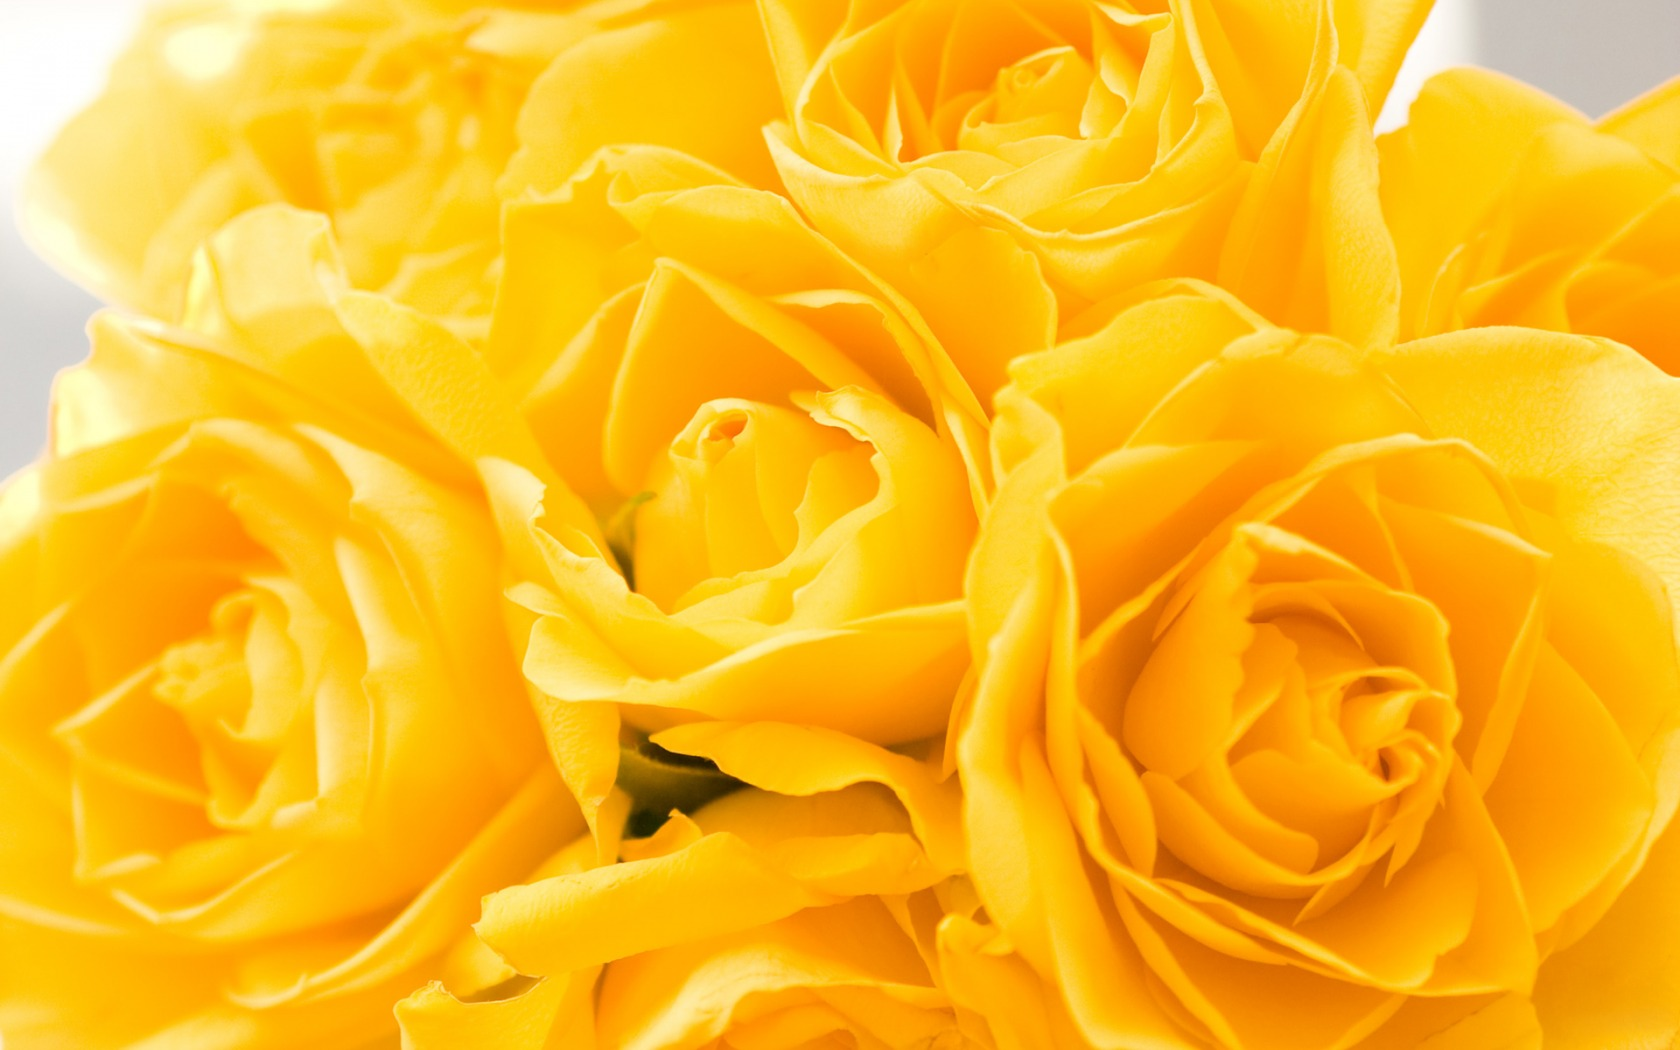 Hd wallpaper yellow rose - Flowers Yellow Roses Desktop Wallpaper Gardening Flower